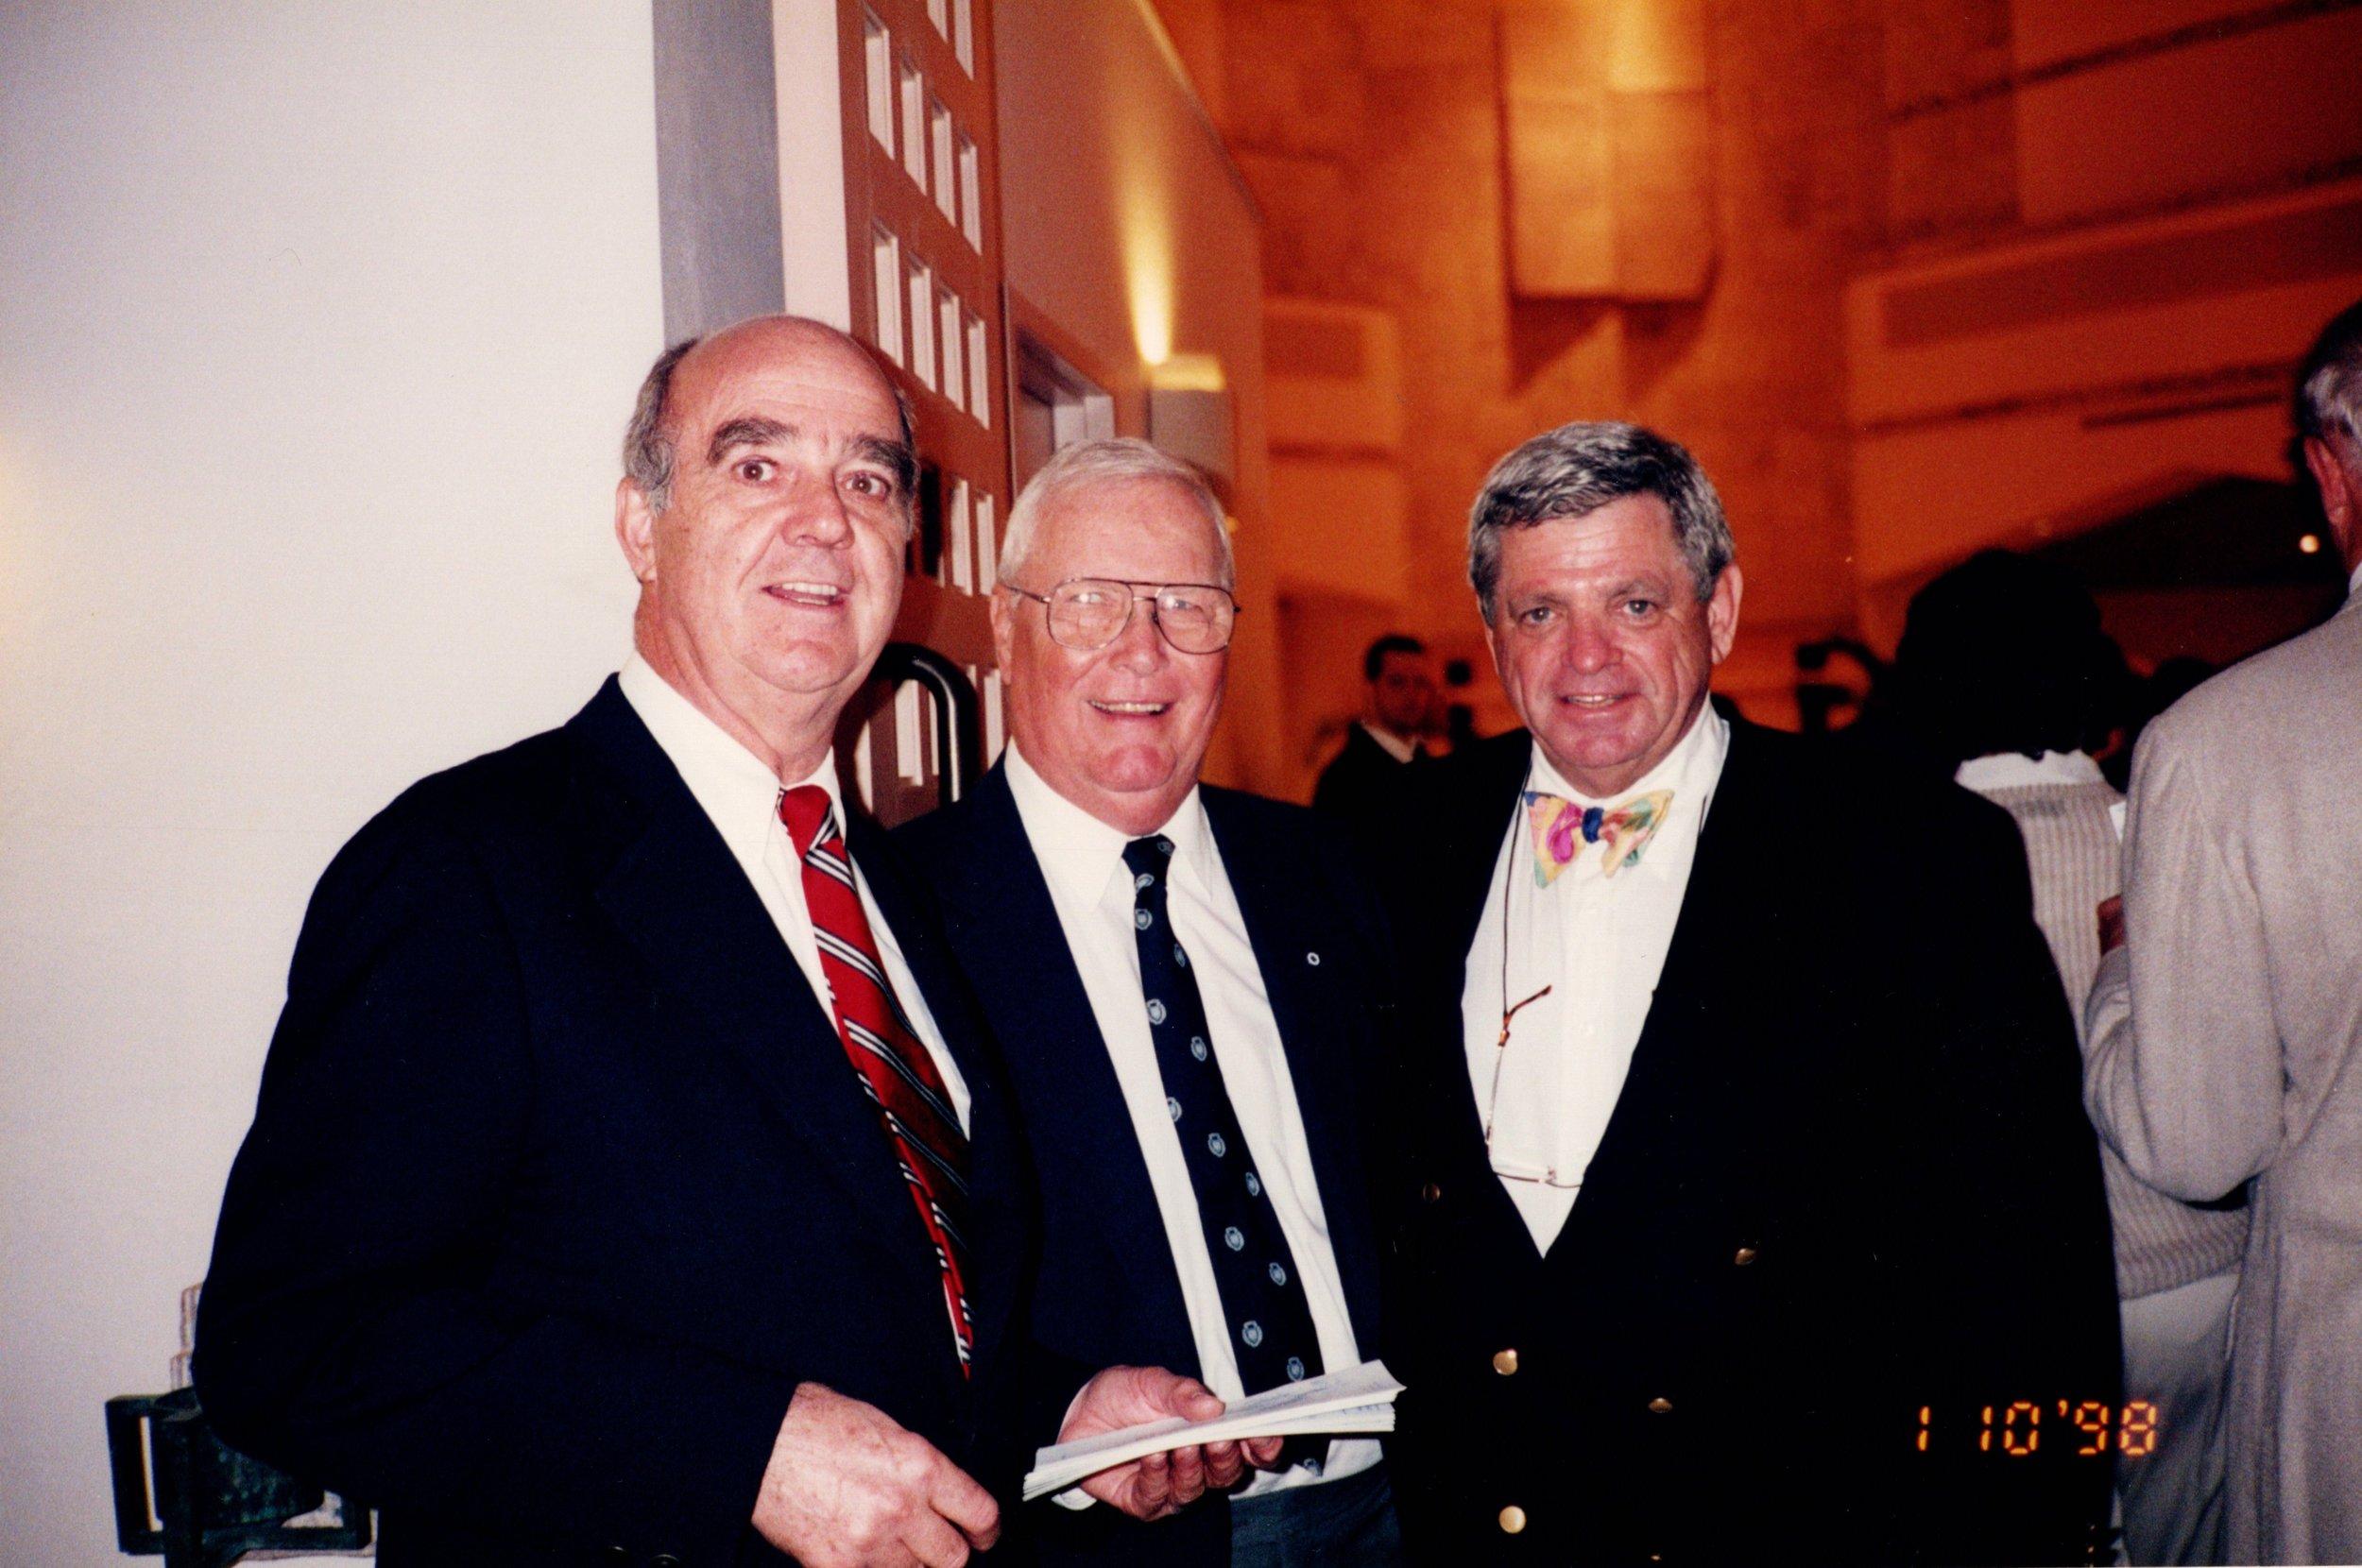 BOB WENZEL '53E, TOM MACKLEFRESH '51, ARNOLD GARFINKEL '62MA